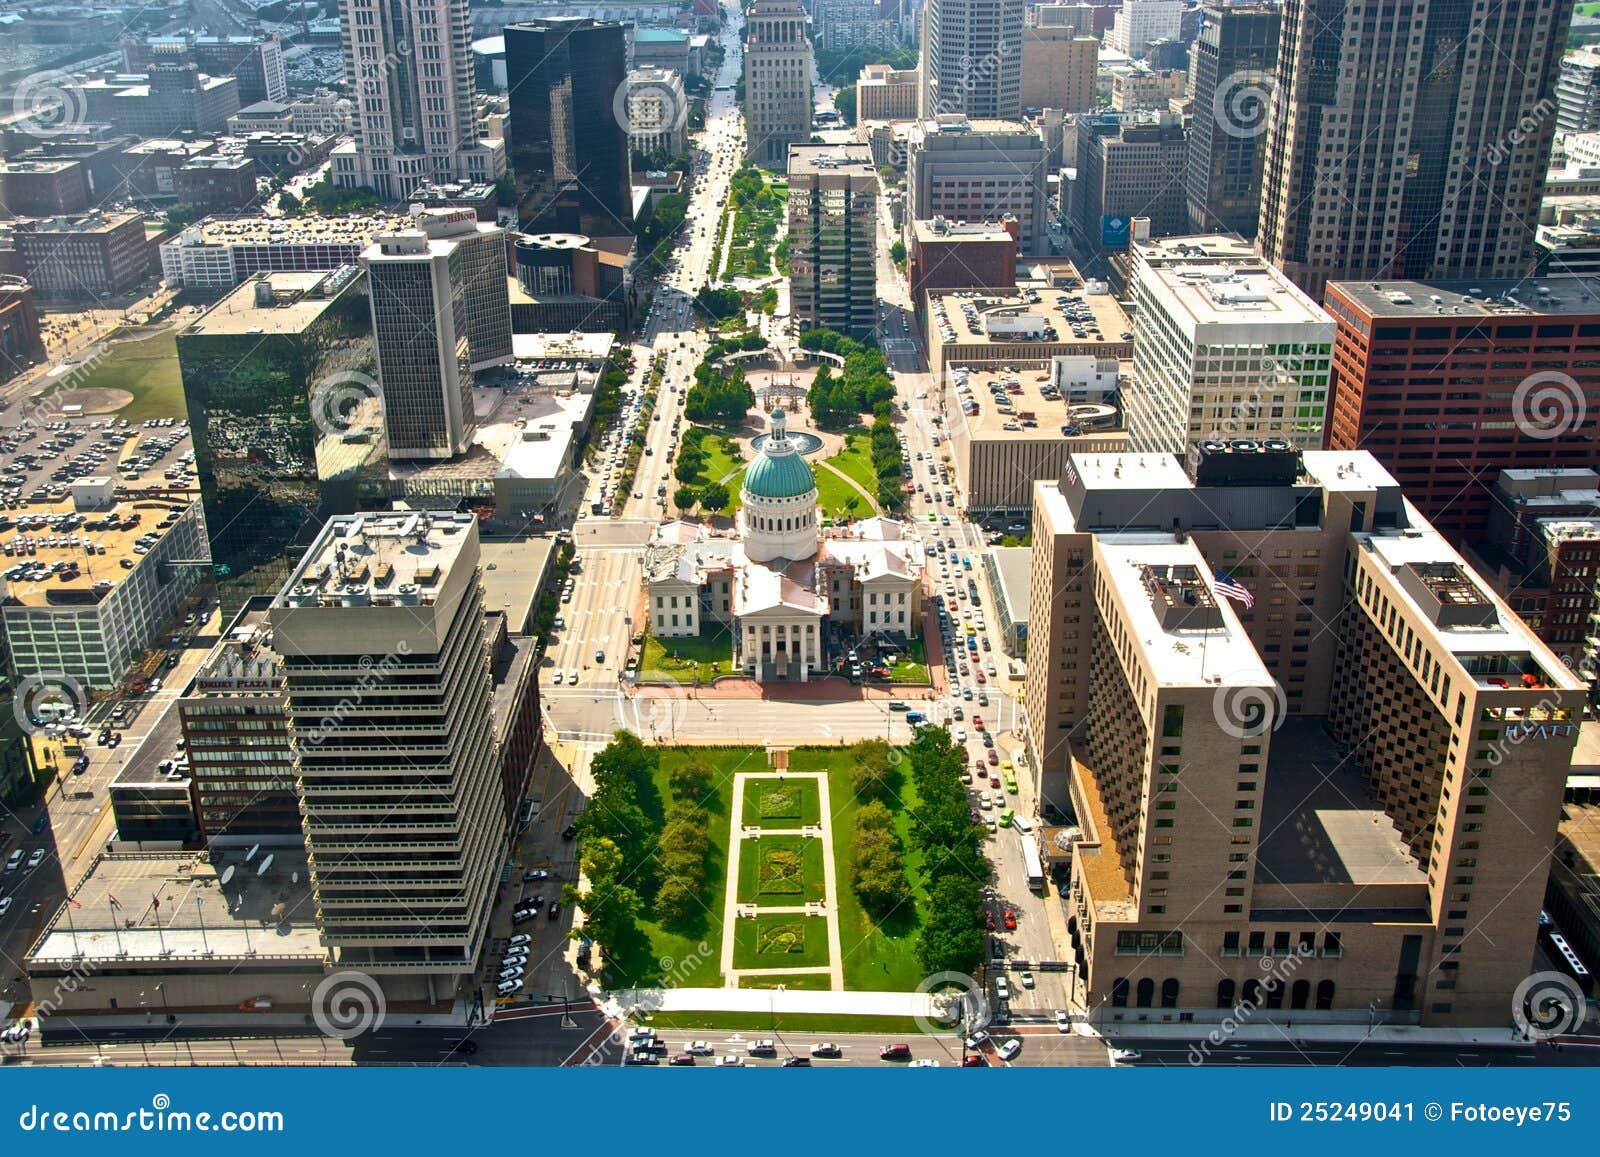 Vista aérea da cidade Scape de St Louis